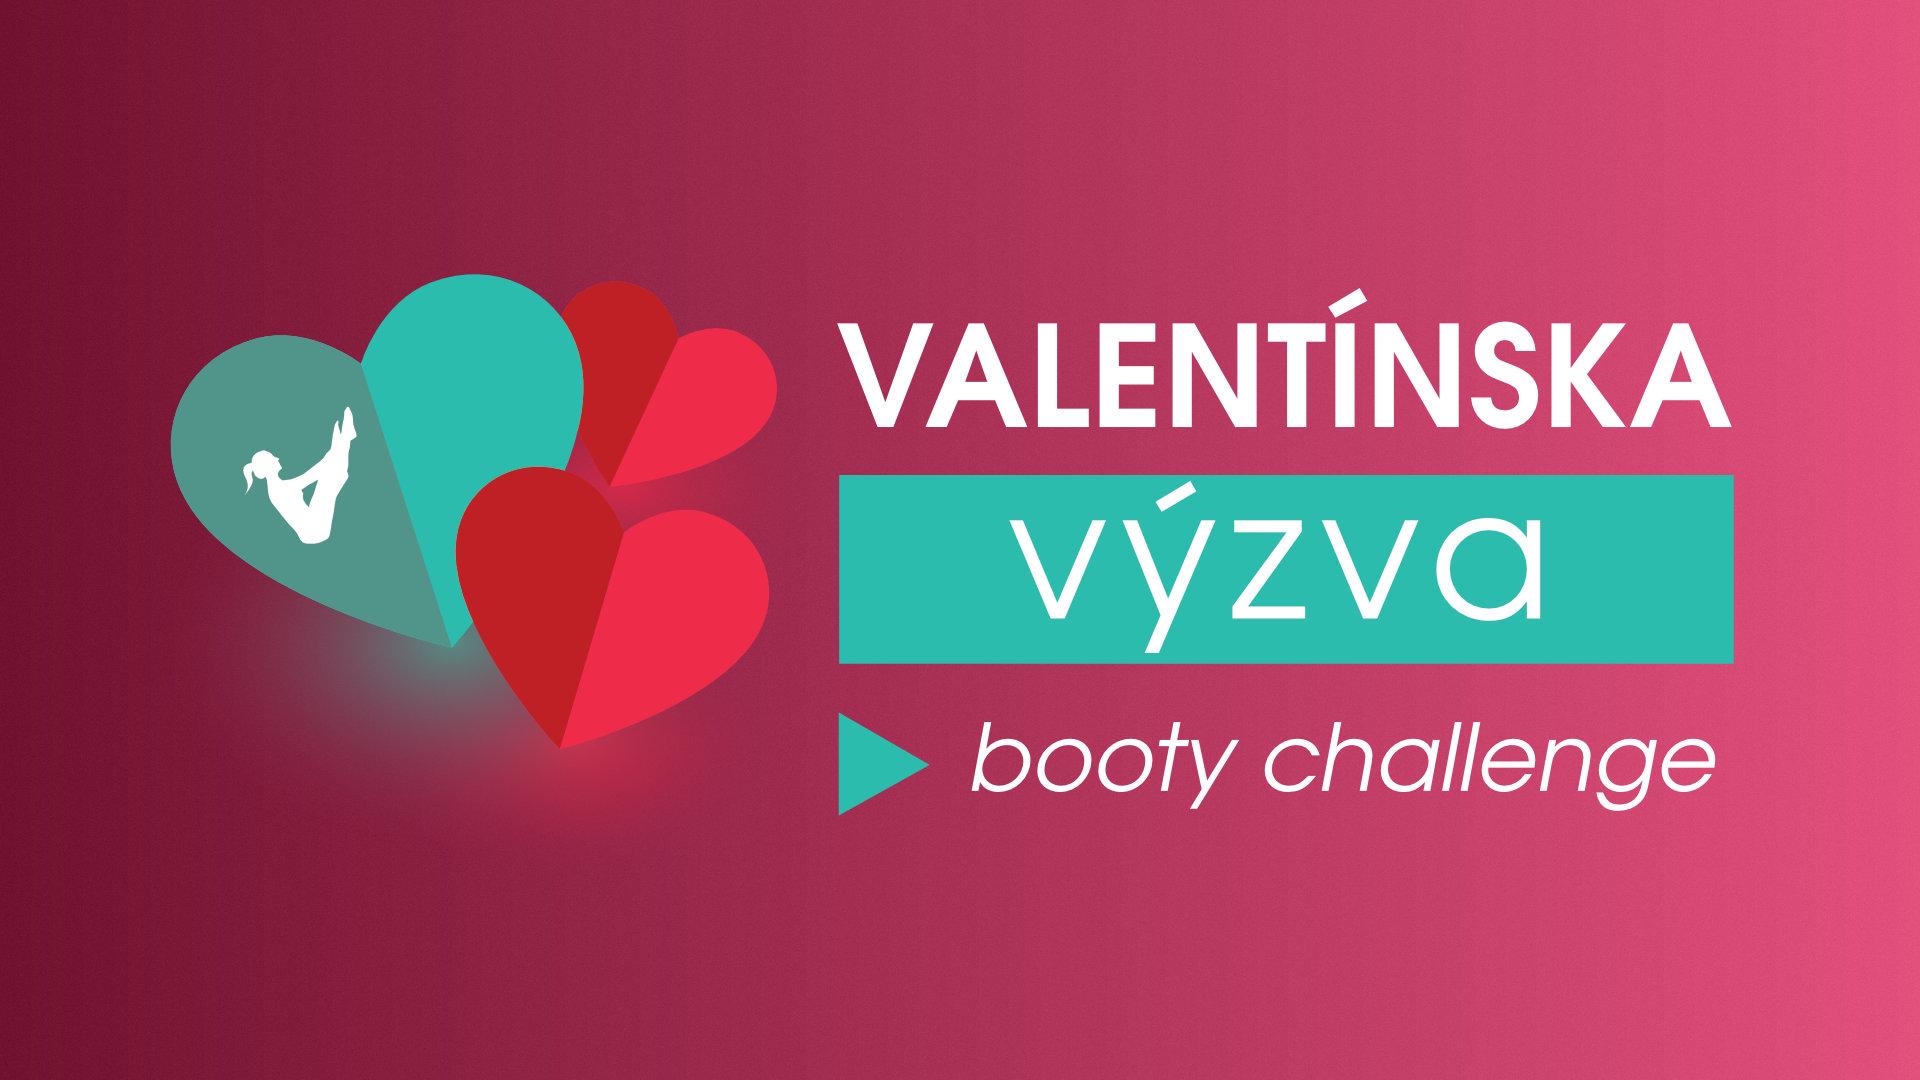 Valentínska výzva - Booty challenge